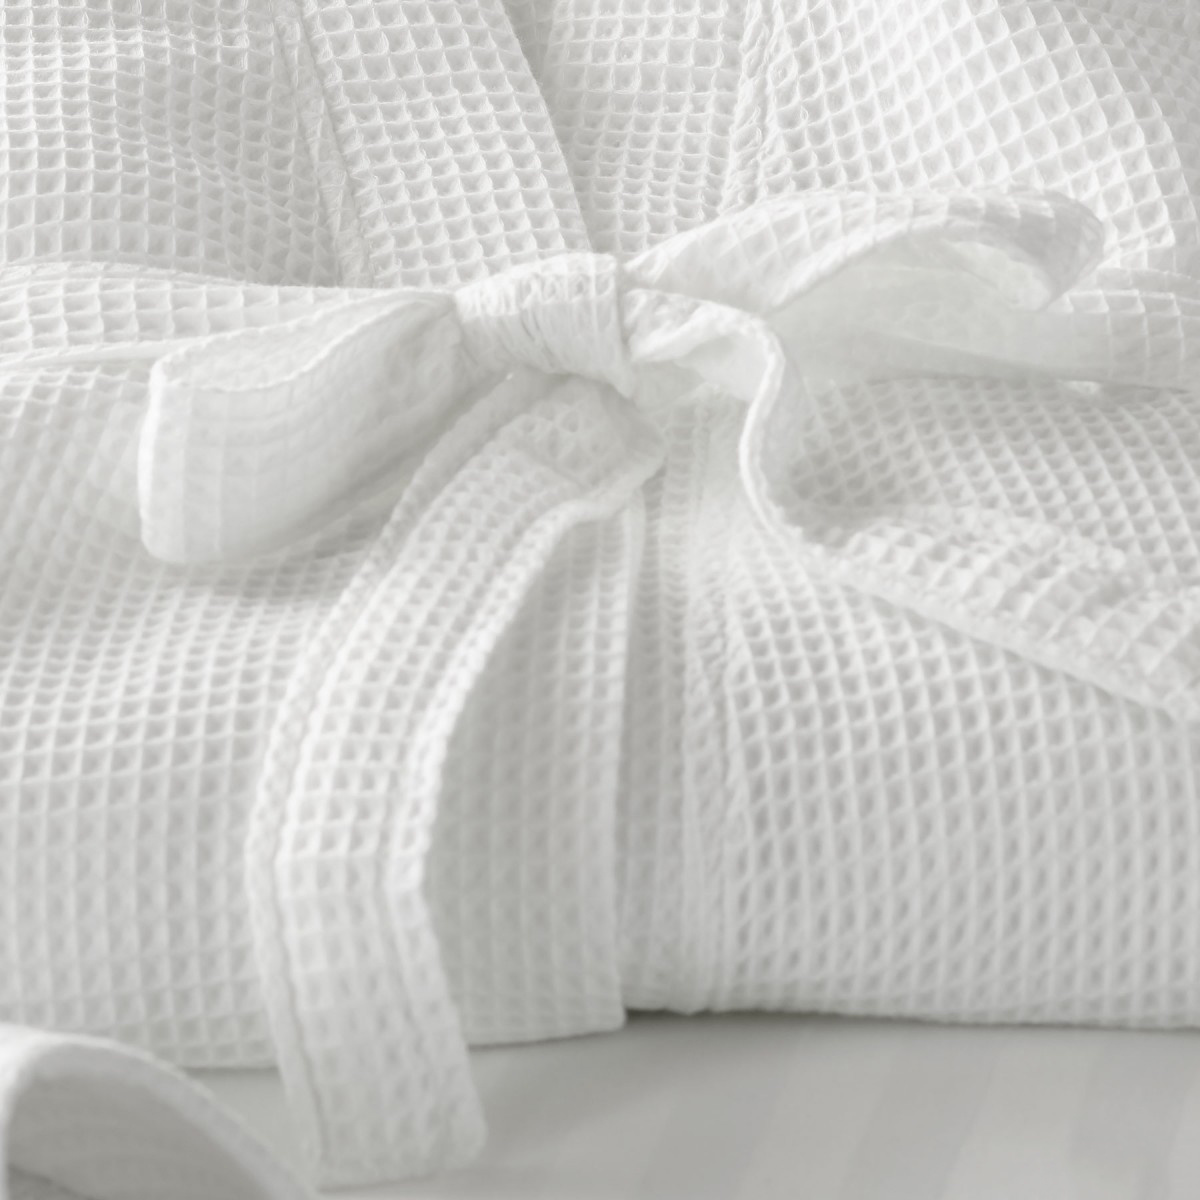 6f38c4dd56 China Luxury Comfortable Full Size 100% Cotton Waffle Hotel Robes ...